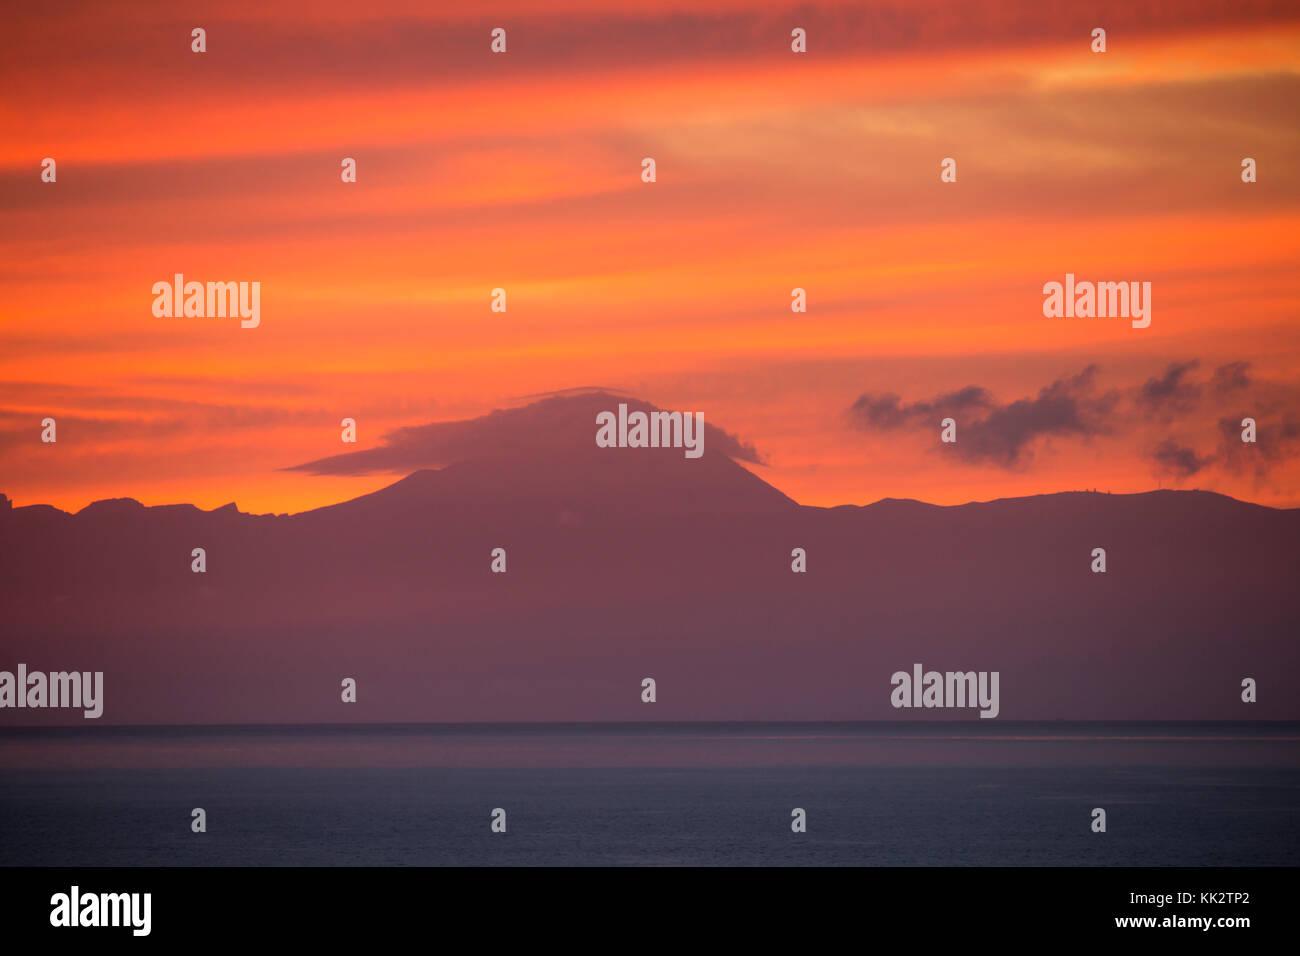 Mount teide summit stock photos mount teide summit stock - Gran canaria weather november ...